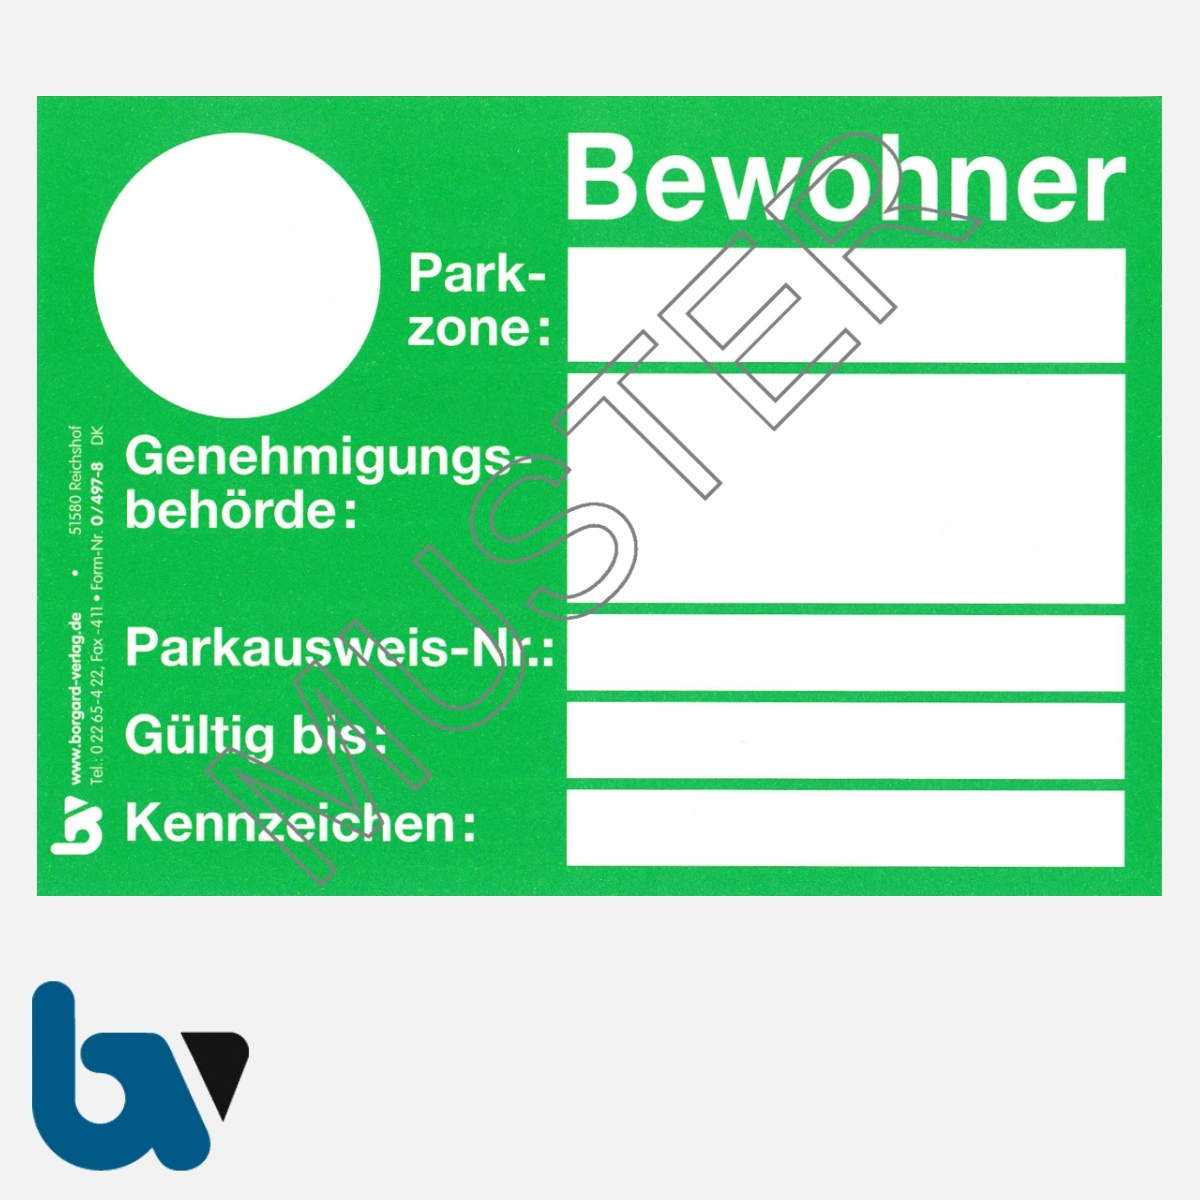 0/497-8 Bewohnerparkausweis amtlich Muster grün DIN A6 Karton VS | Borgard Verlag GmbH